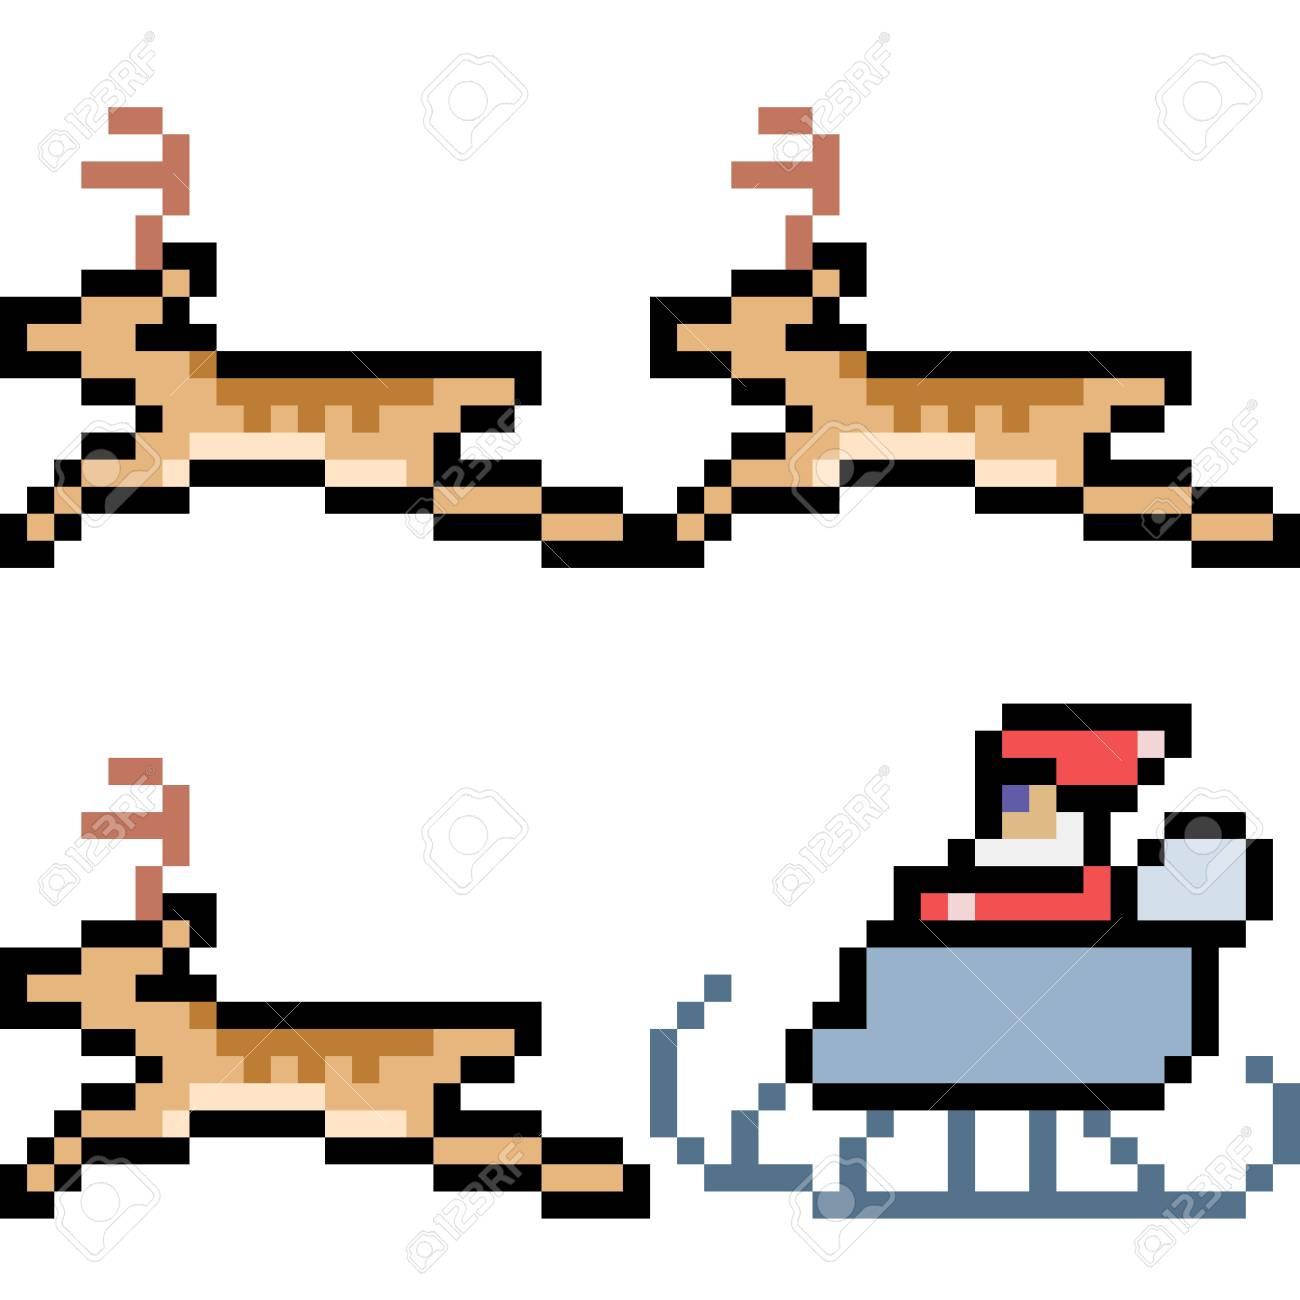 Pixel Art Illustration Of Santa With Reindeers